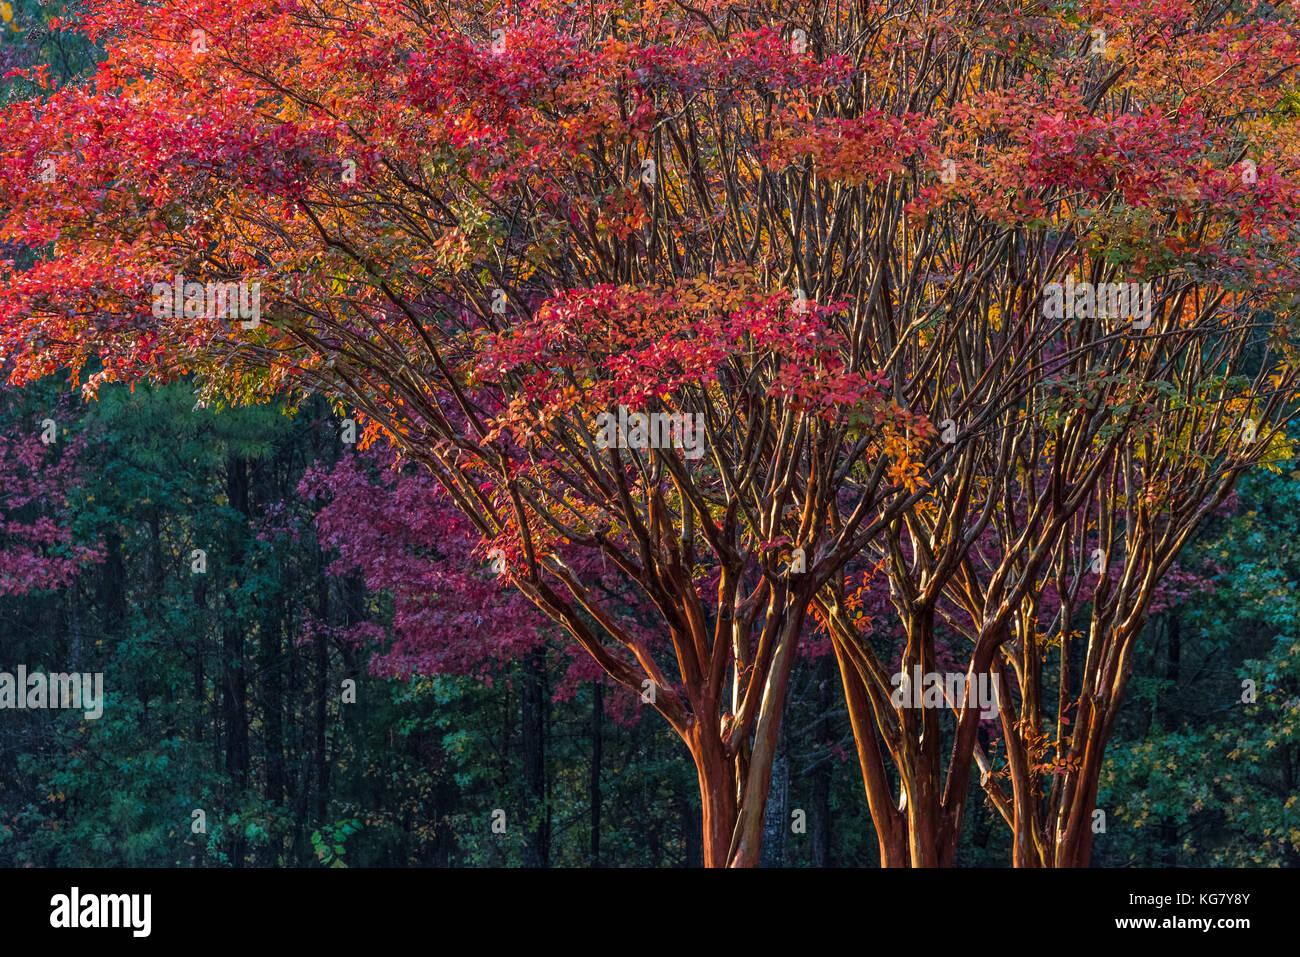 Colorful Autumn trees on vivid display at sunset in Metro Atlanta, Georgia, USA. Stock Photo